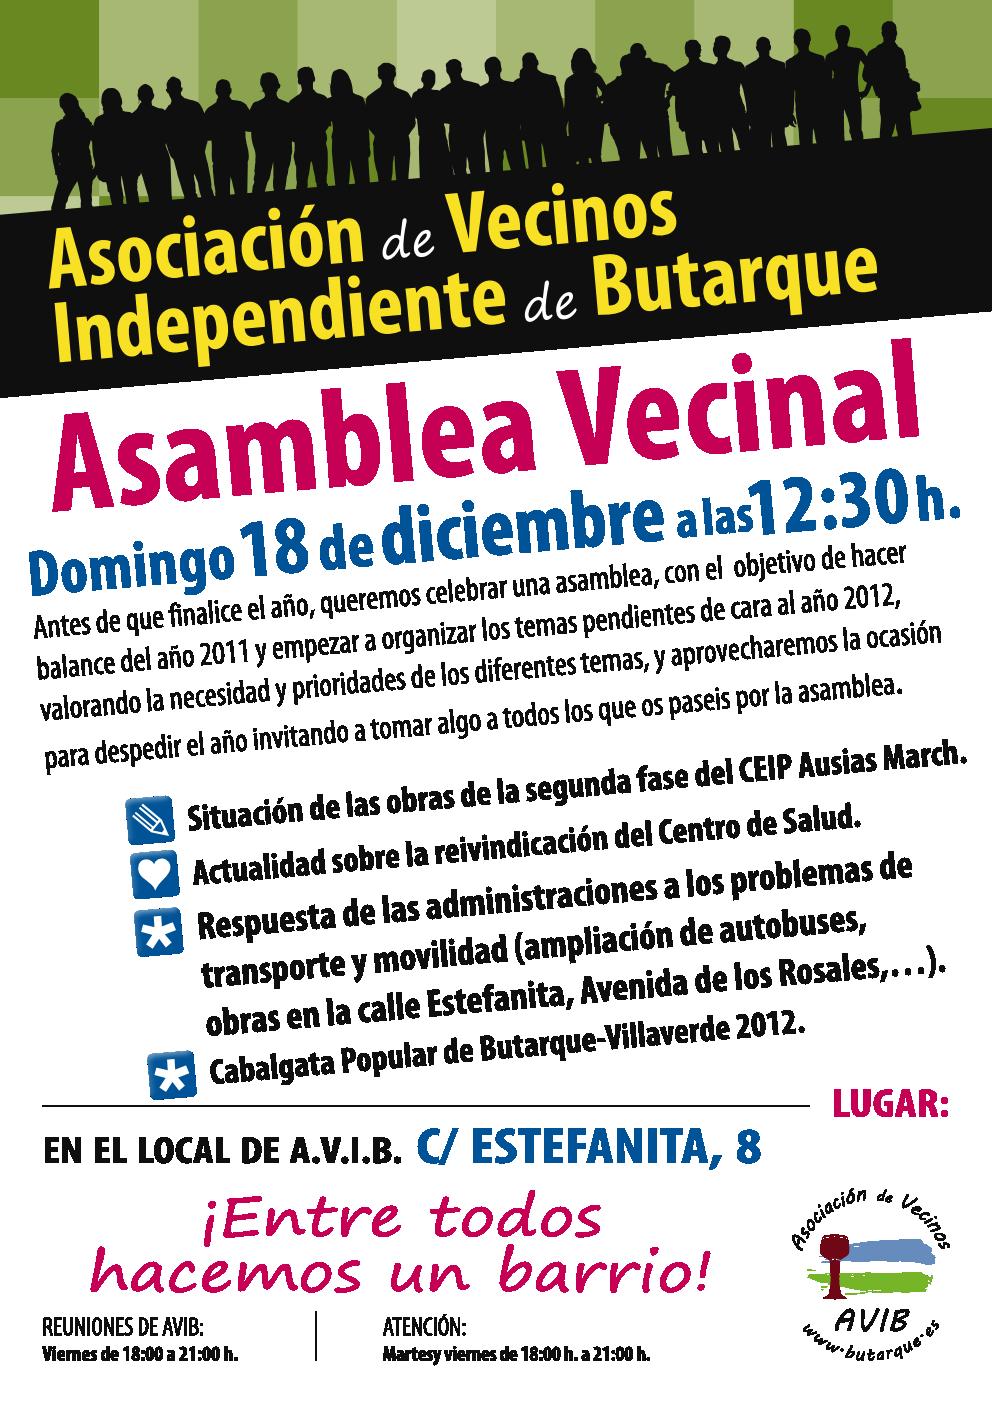 CARTEL_ASAMBLEA_VECINAL_18_dic_2011.png